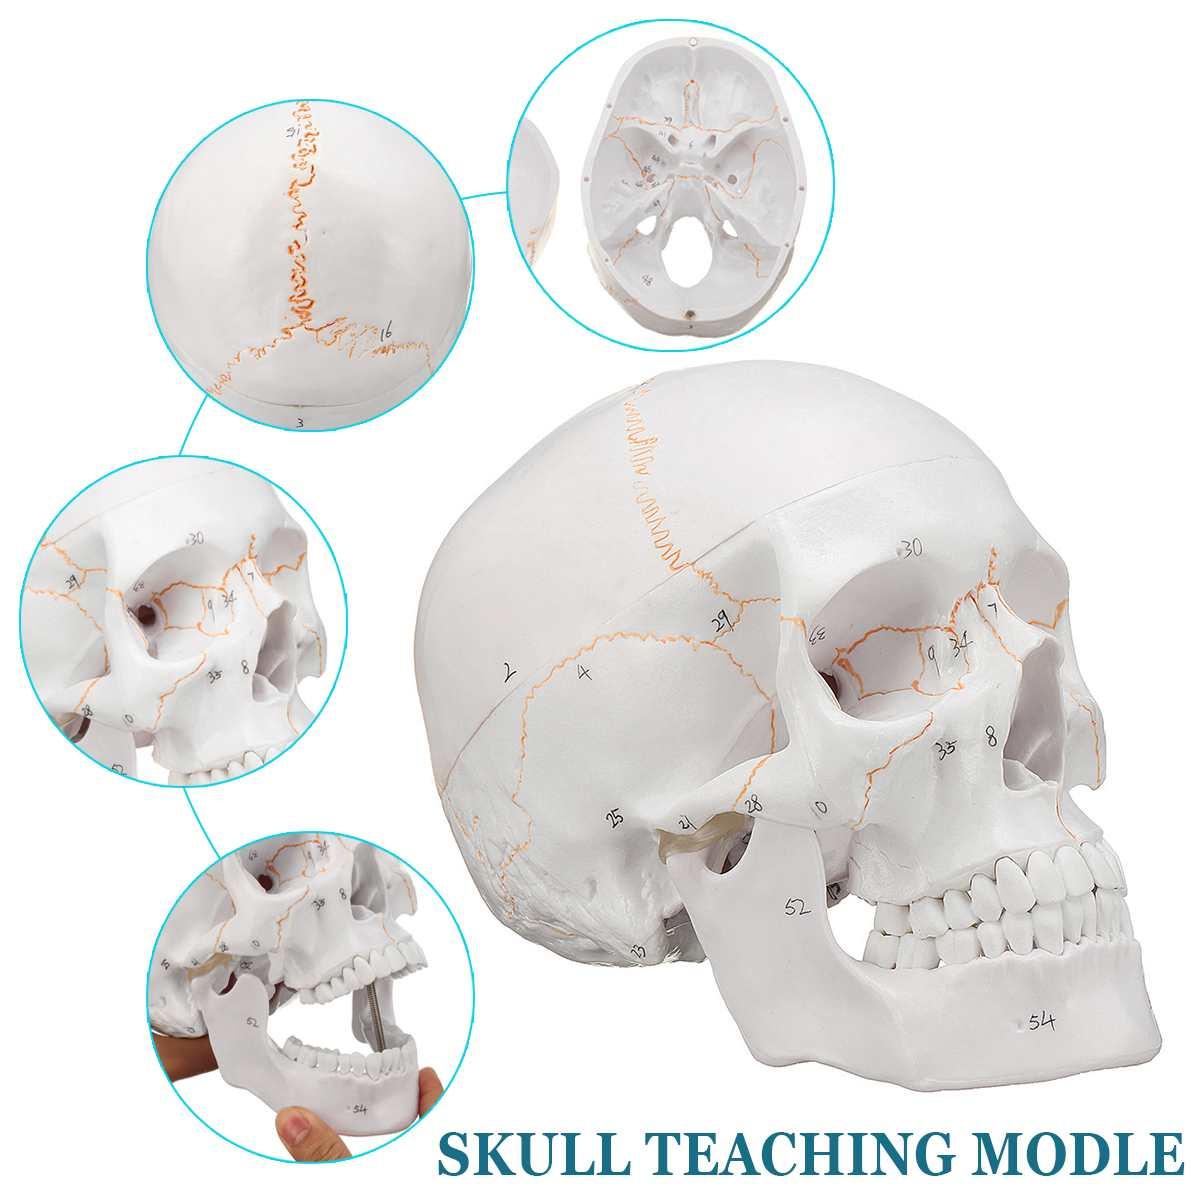 1:1 Skull Model Convenient Of Human Skull Model Medicine Skull Human Anatomical Anatomy Head Studying Anatomy Teaching Supplies